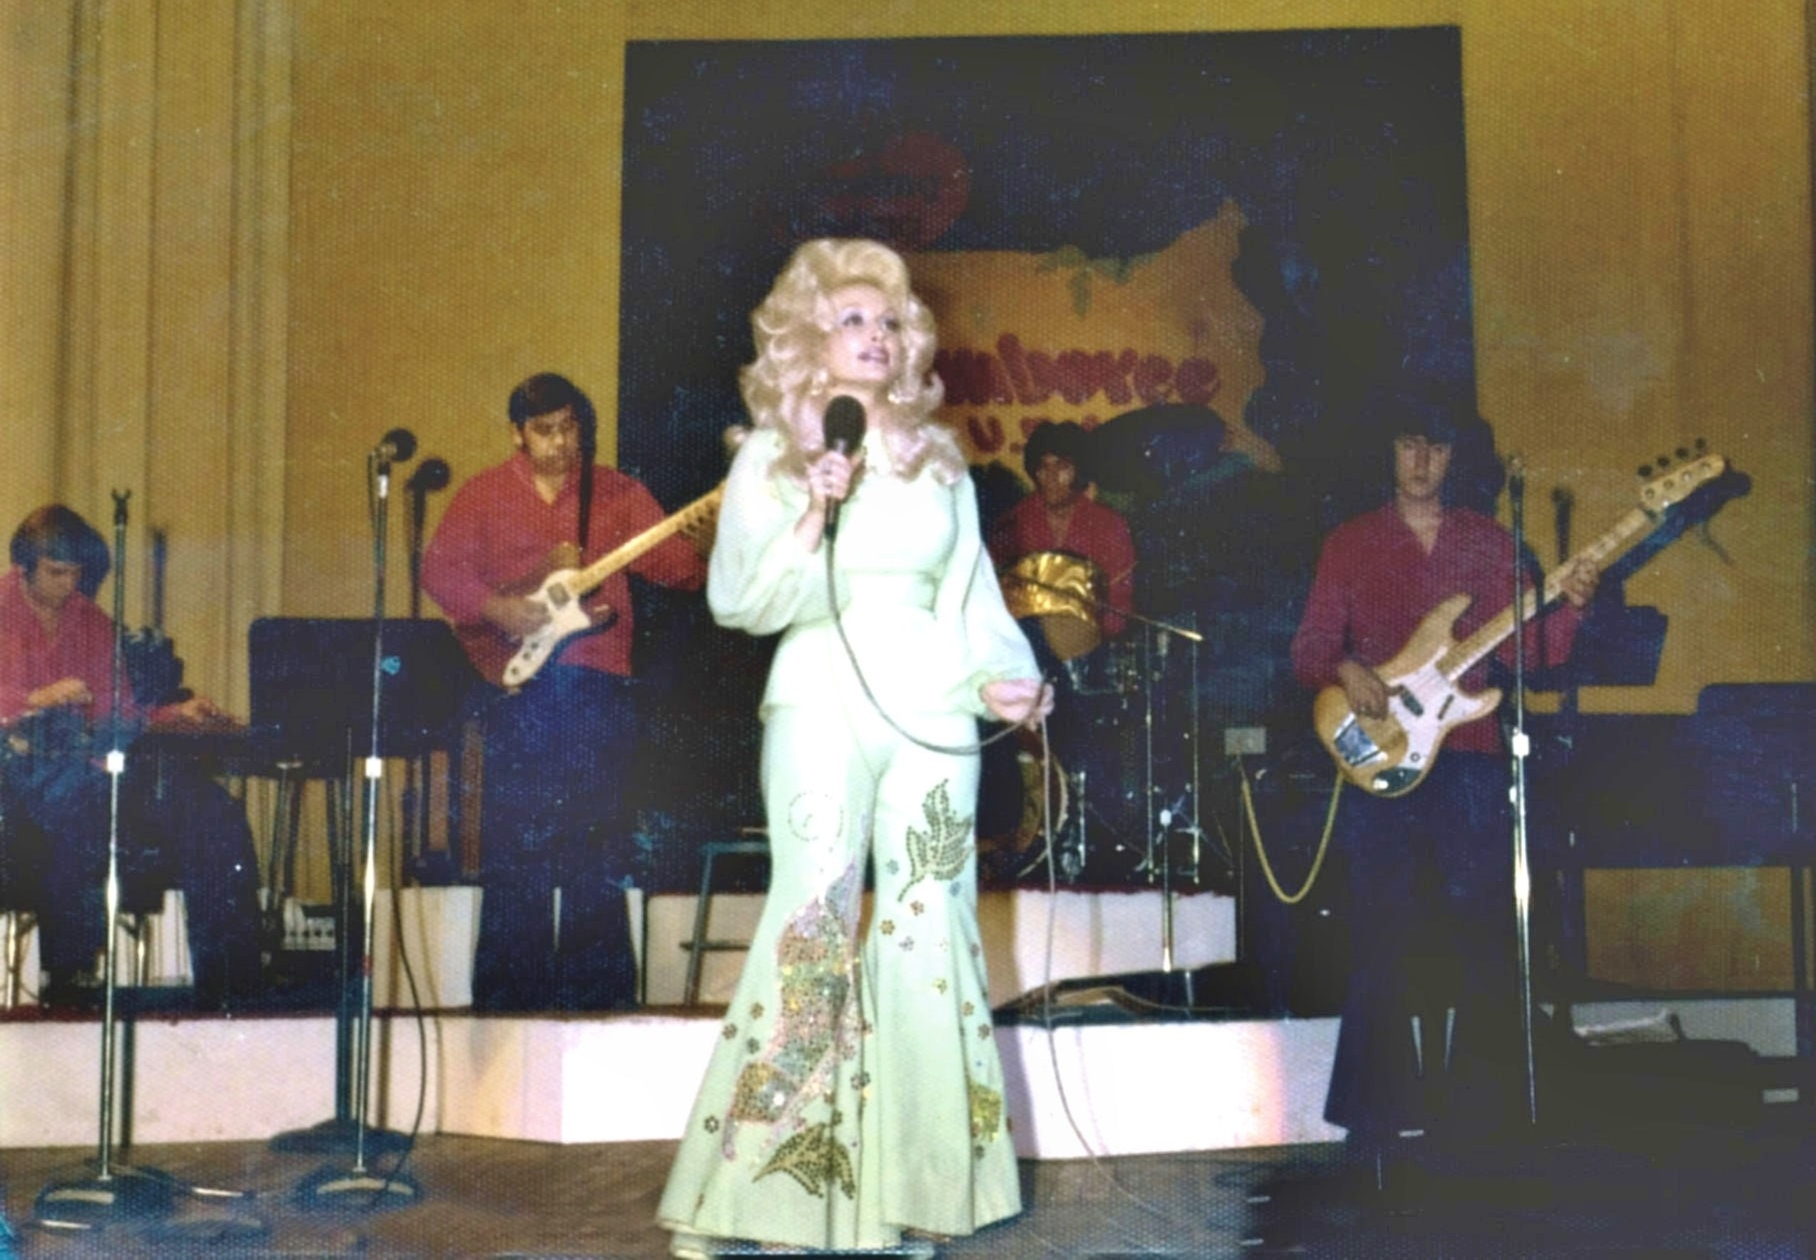 Dolly_Parton_Jamboree_3_1976